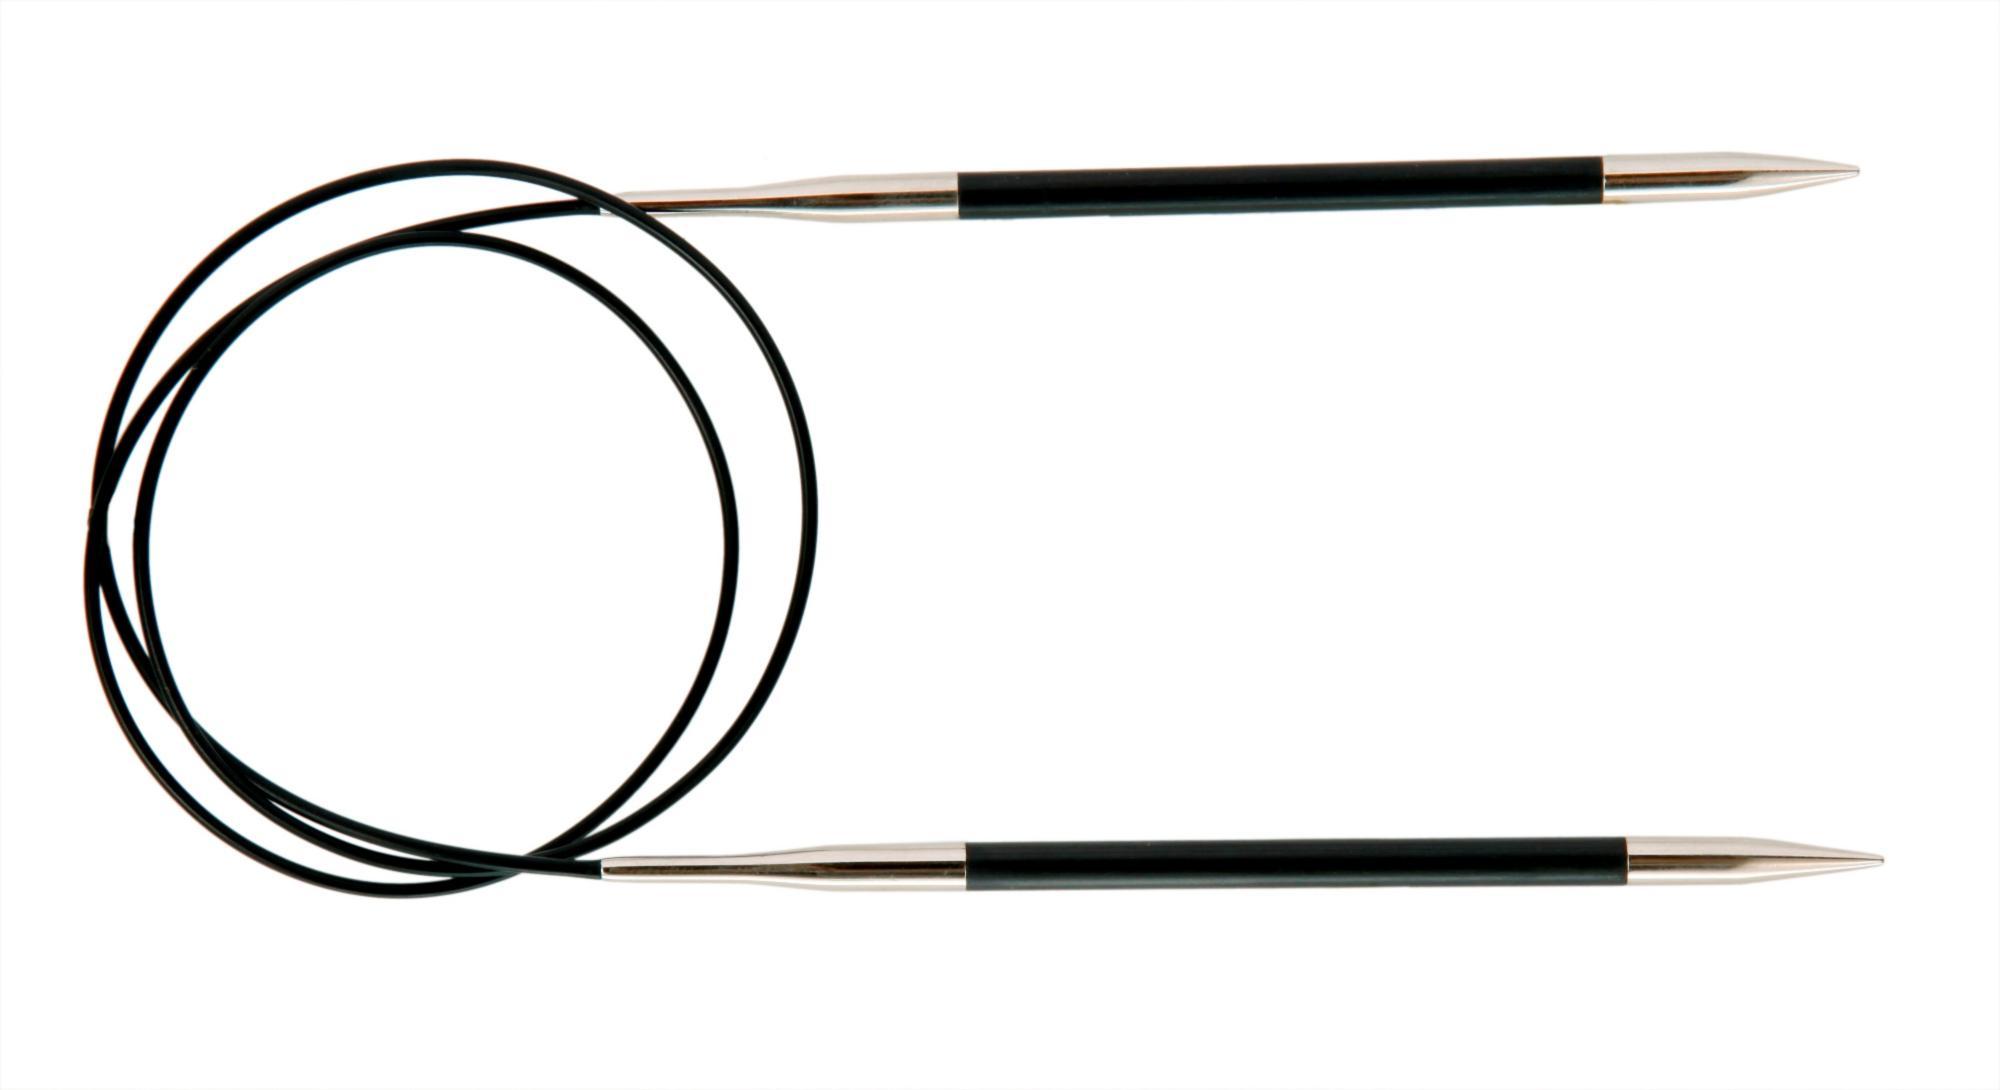 Спицы круговые 80 см Karbonz KnitPro, 41185, 3.25 мм